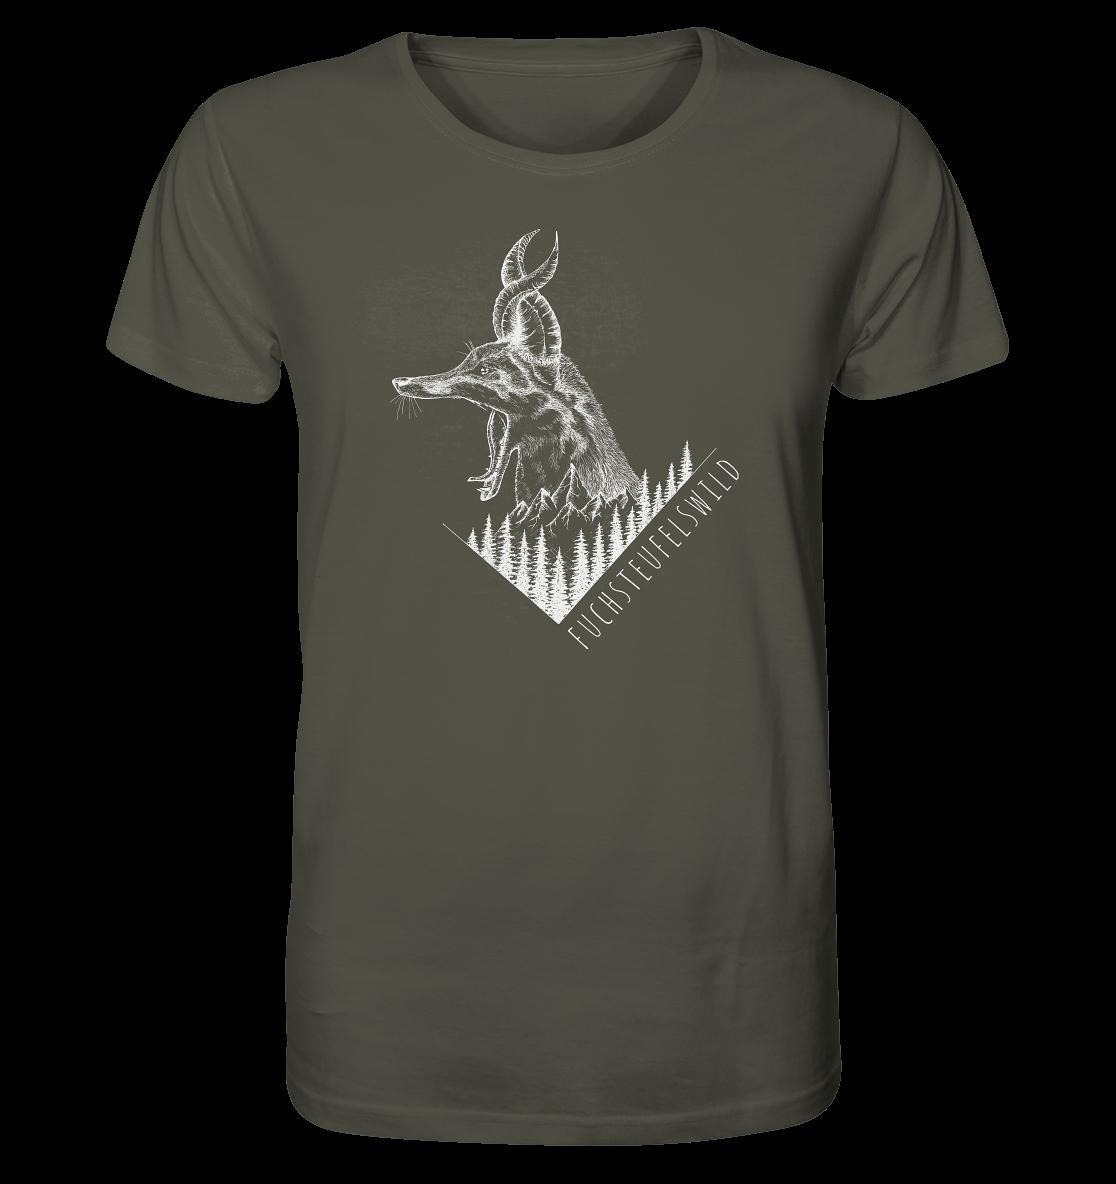 front-organic-shirt-545348-1116x-3.png